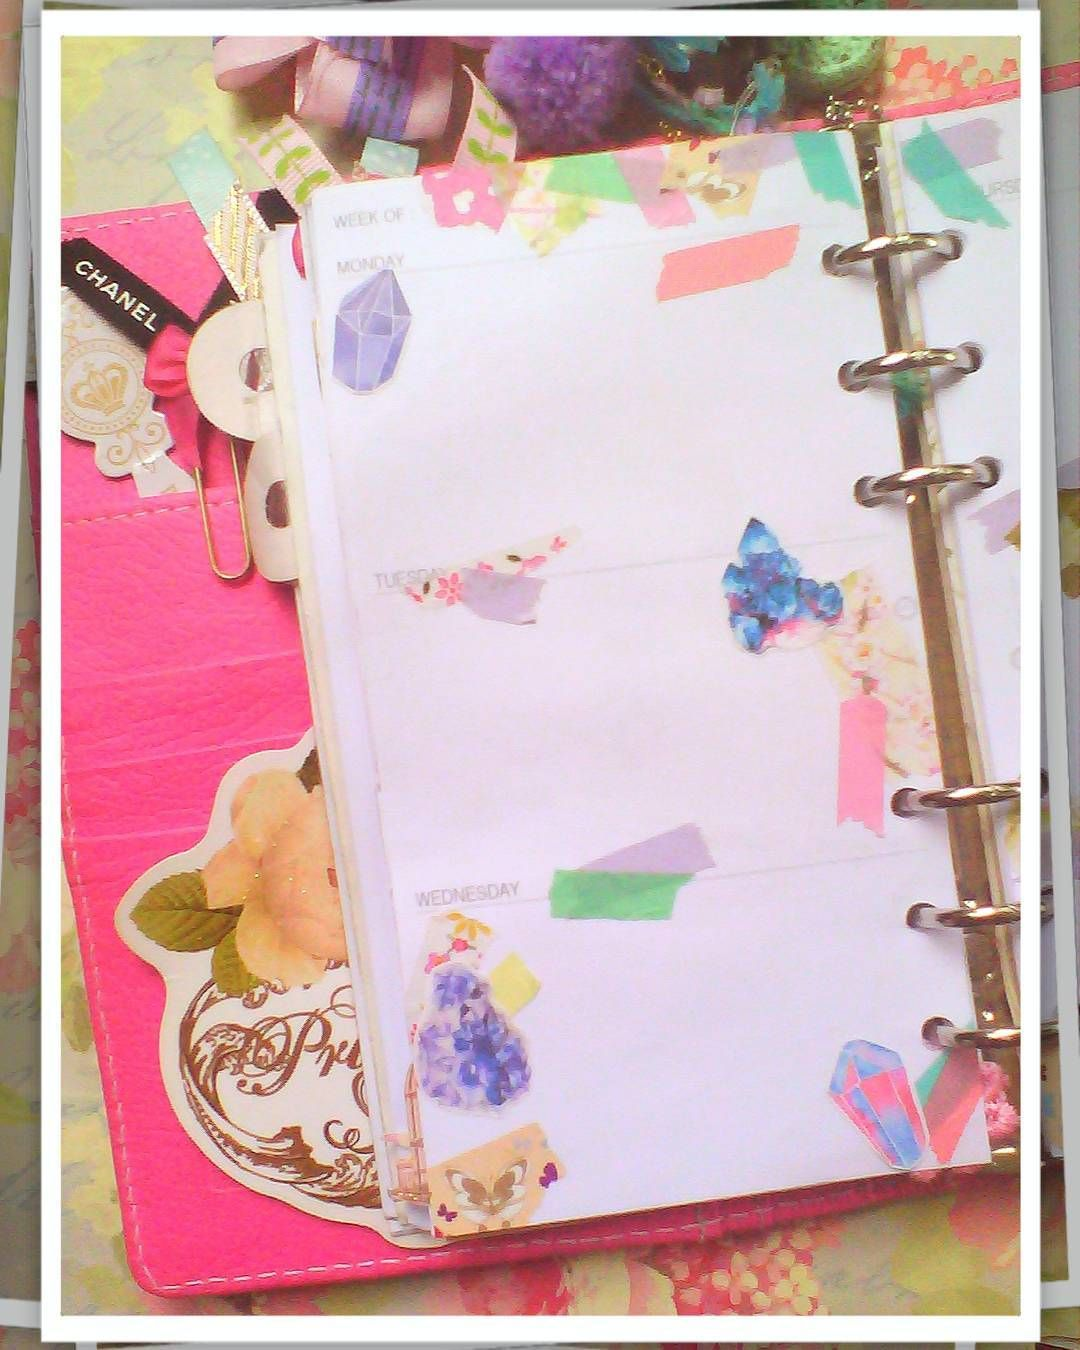 Half of gems weekly spread . . . . . . . . . #mwlgiveaway #madewithloveindonesia  #flowerstagram #plannerspread #plannerdecoration #plannerinspiration #plannerd #kikkik #kikkiklove #kikkikplannerlove #katespadewellesley #filofax #filofaxlove #eclp #erincondrenplanner #happyplanner #meandmybigideas #planneraddict #plannernerd #plannerjunkie #plannergeek #plannergirl #plannerindo #plannerindonesia #planningwithbelinda #midoritravelersnotebook #plannerlove #indonesianplannercommunity by…